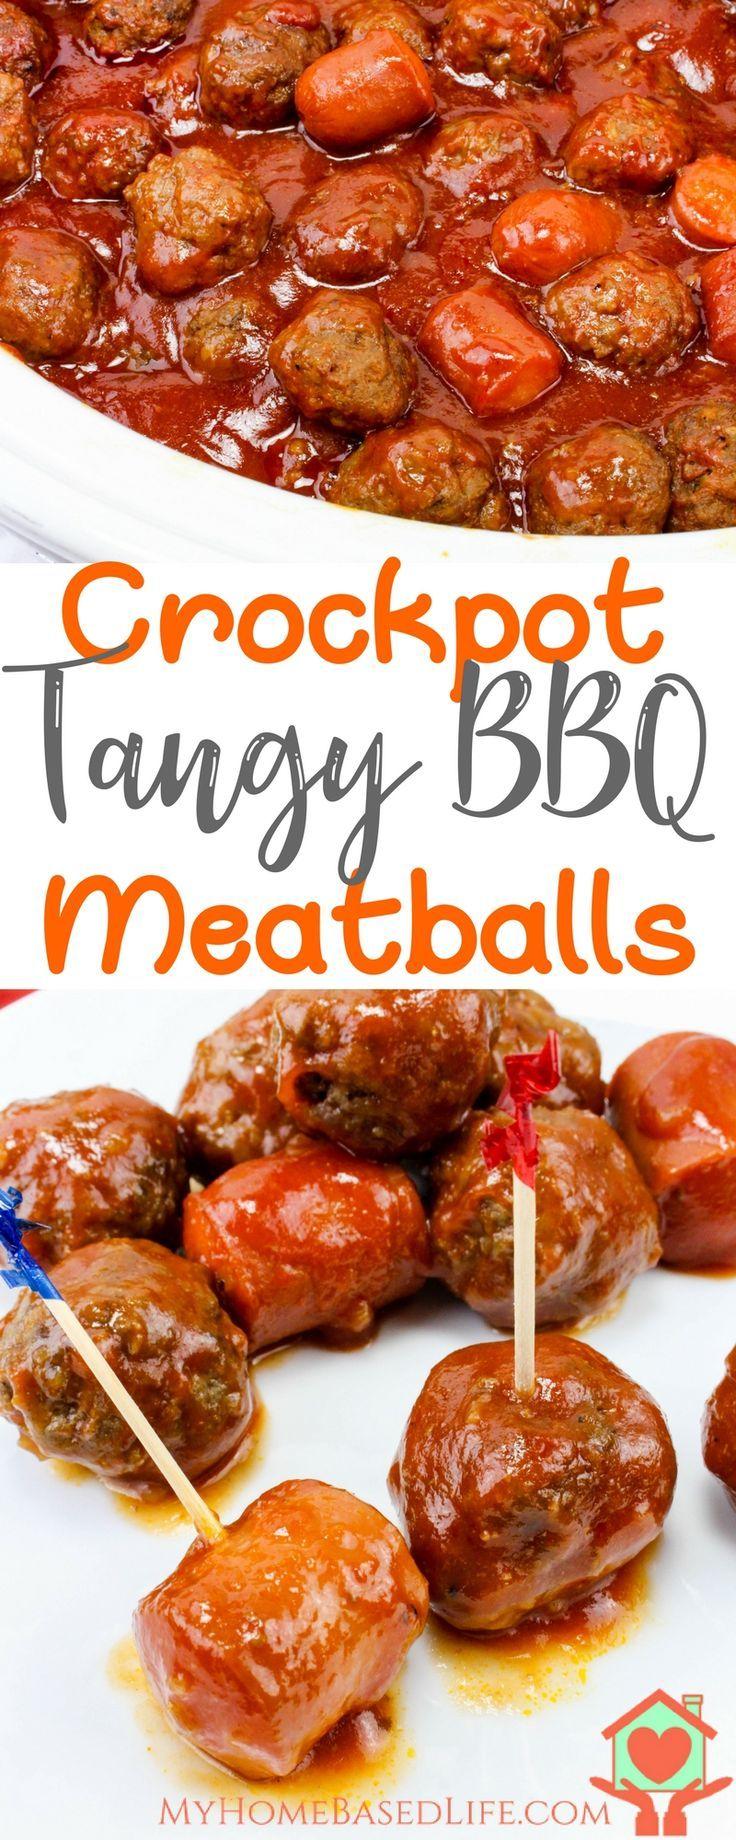 Crockpot Tangy BBQ Meatballs   Crockpot Recipe   Crockpot Meatballs   BBQ Meatball Recipe   Meatball Recipe   Easy Meatball Recipe   #meatballrecipe #crockpotmeals via @myhomebasedlife